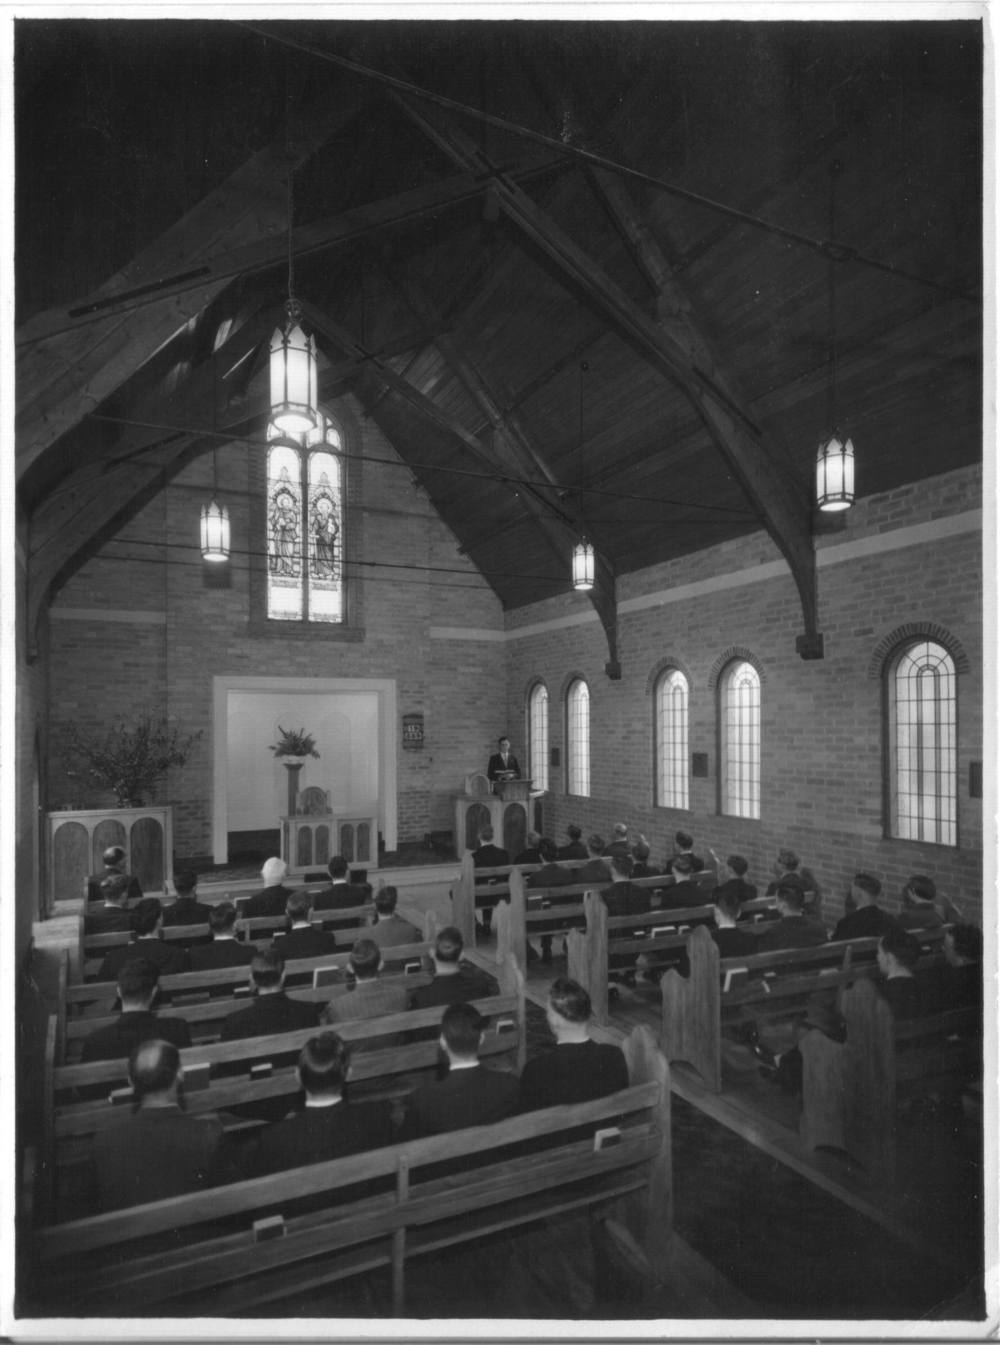 Chapel, 1950s